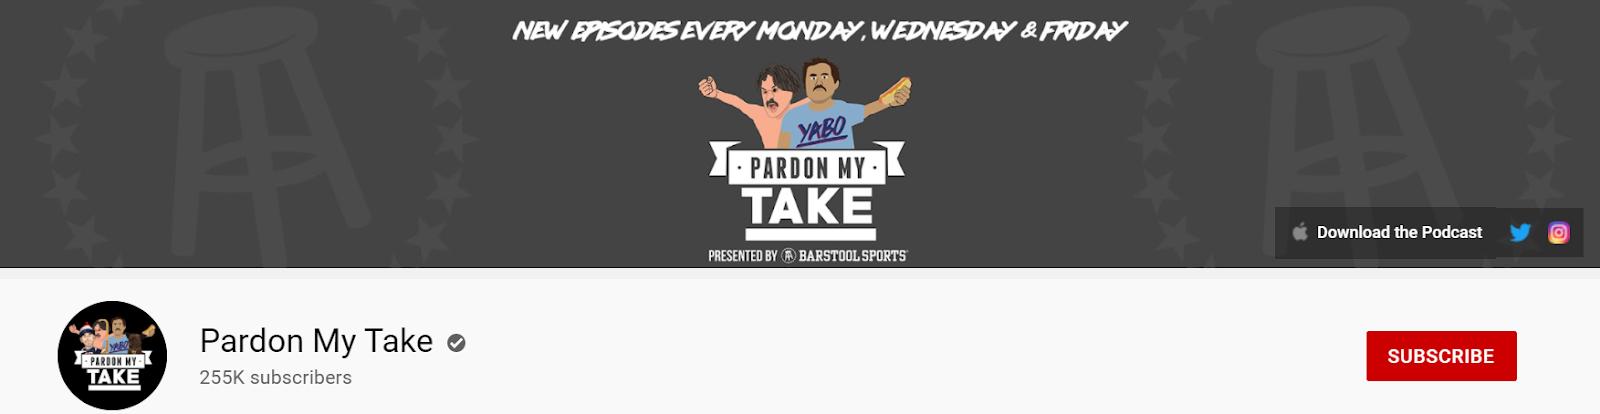 Pardon My Take YouTube